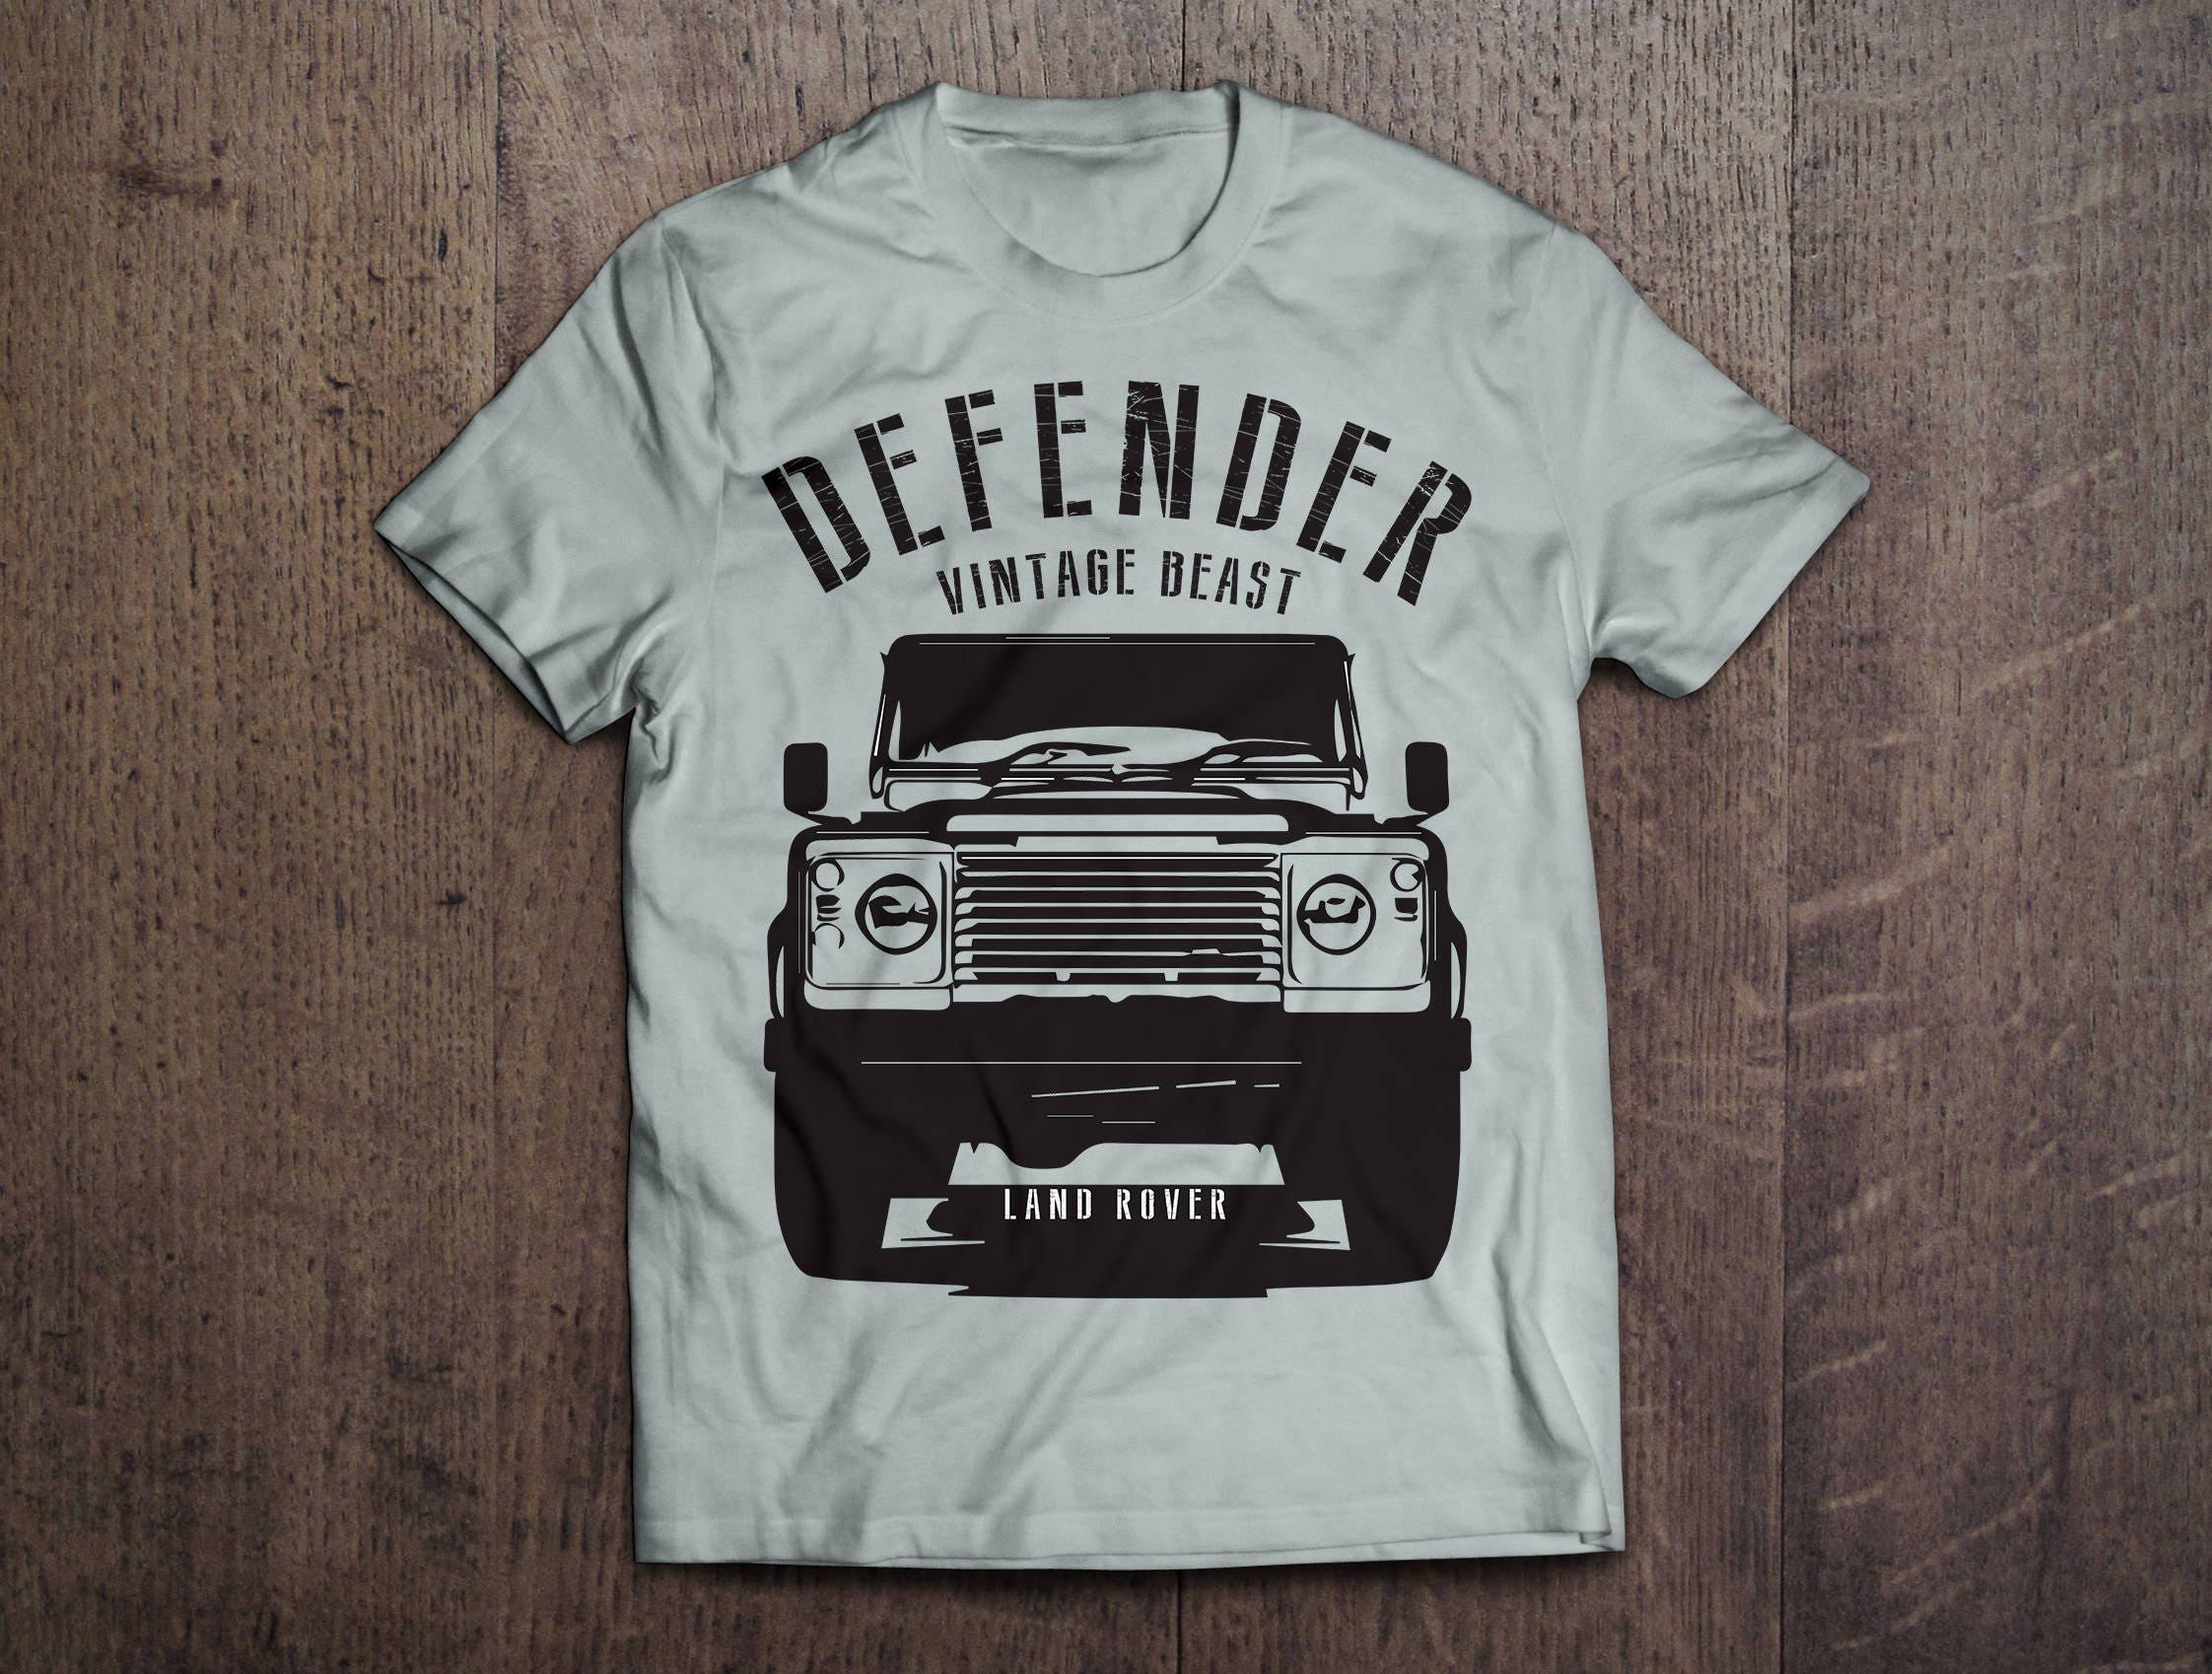 Land Rover Defender shirts, Jeep t shirt, Land Rover shirt, Cars t shirts,  men tshirts, women t shirts, Defender shirts, jeep life shirts